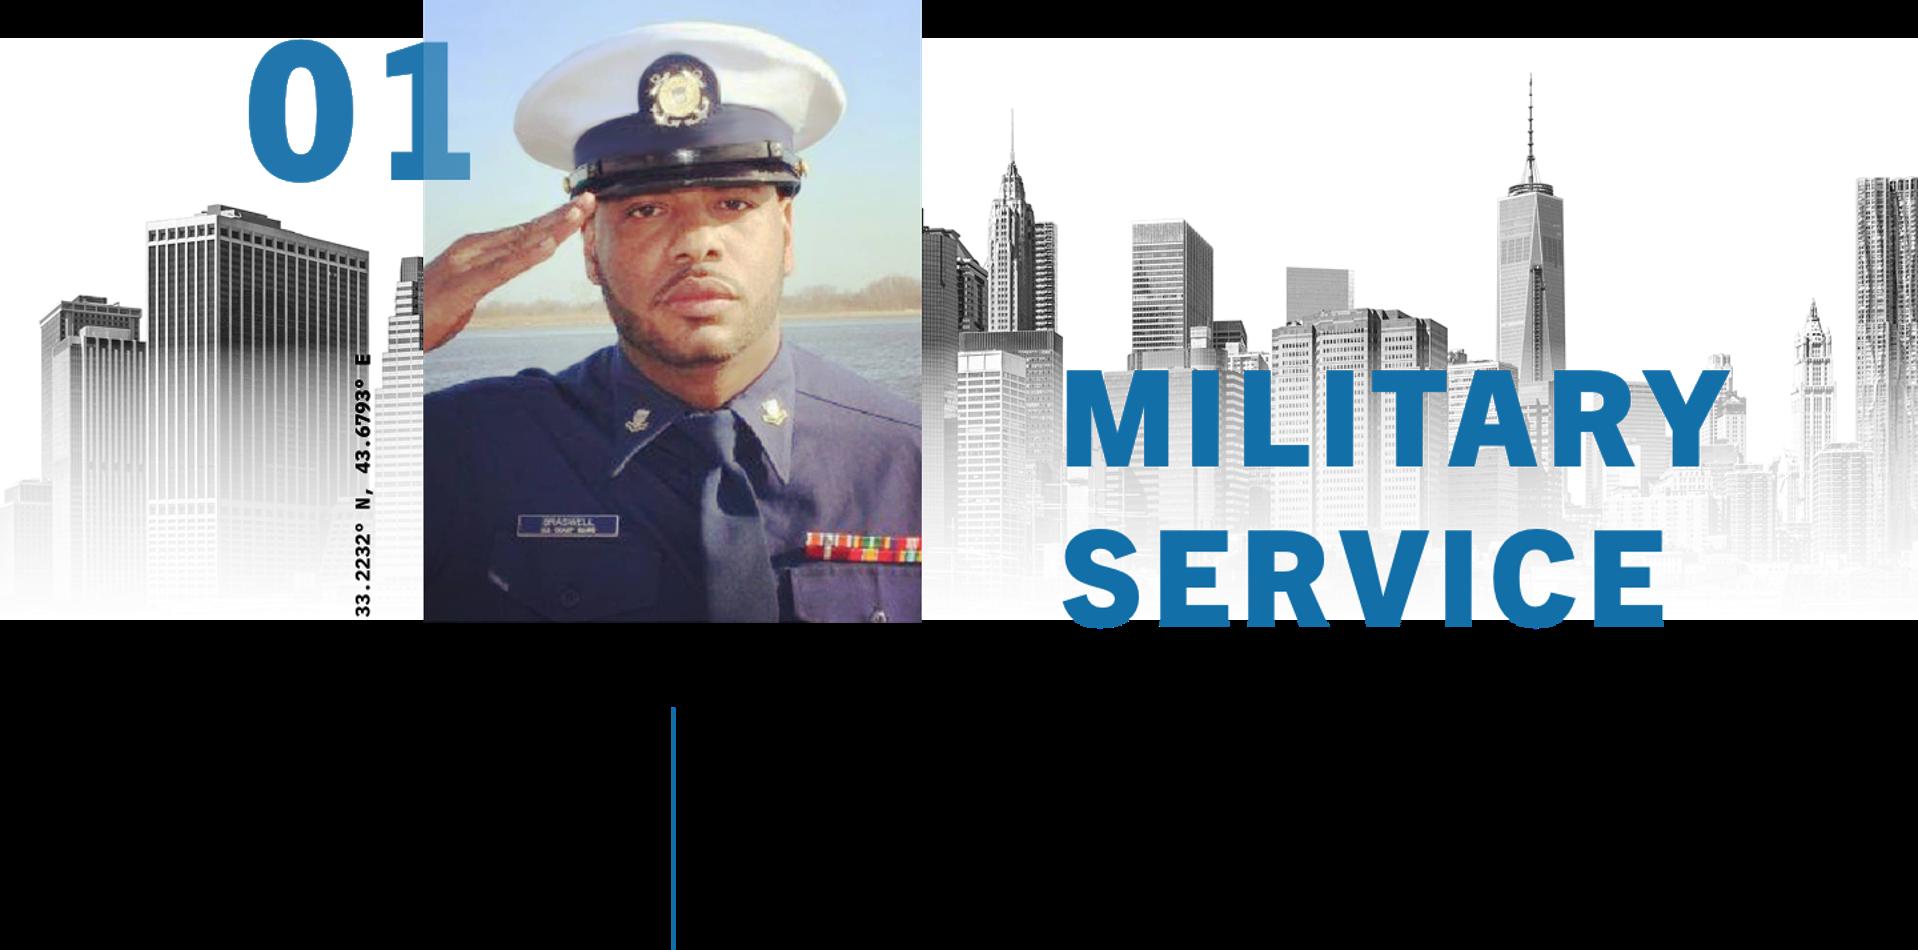 MILITARY SERVICE - New York Metro Area